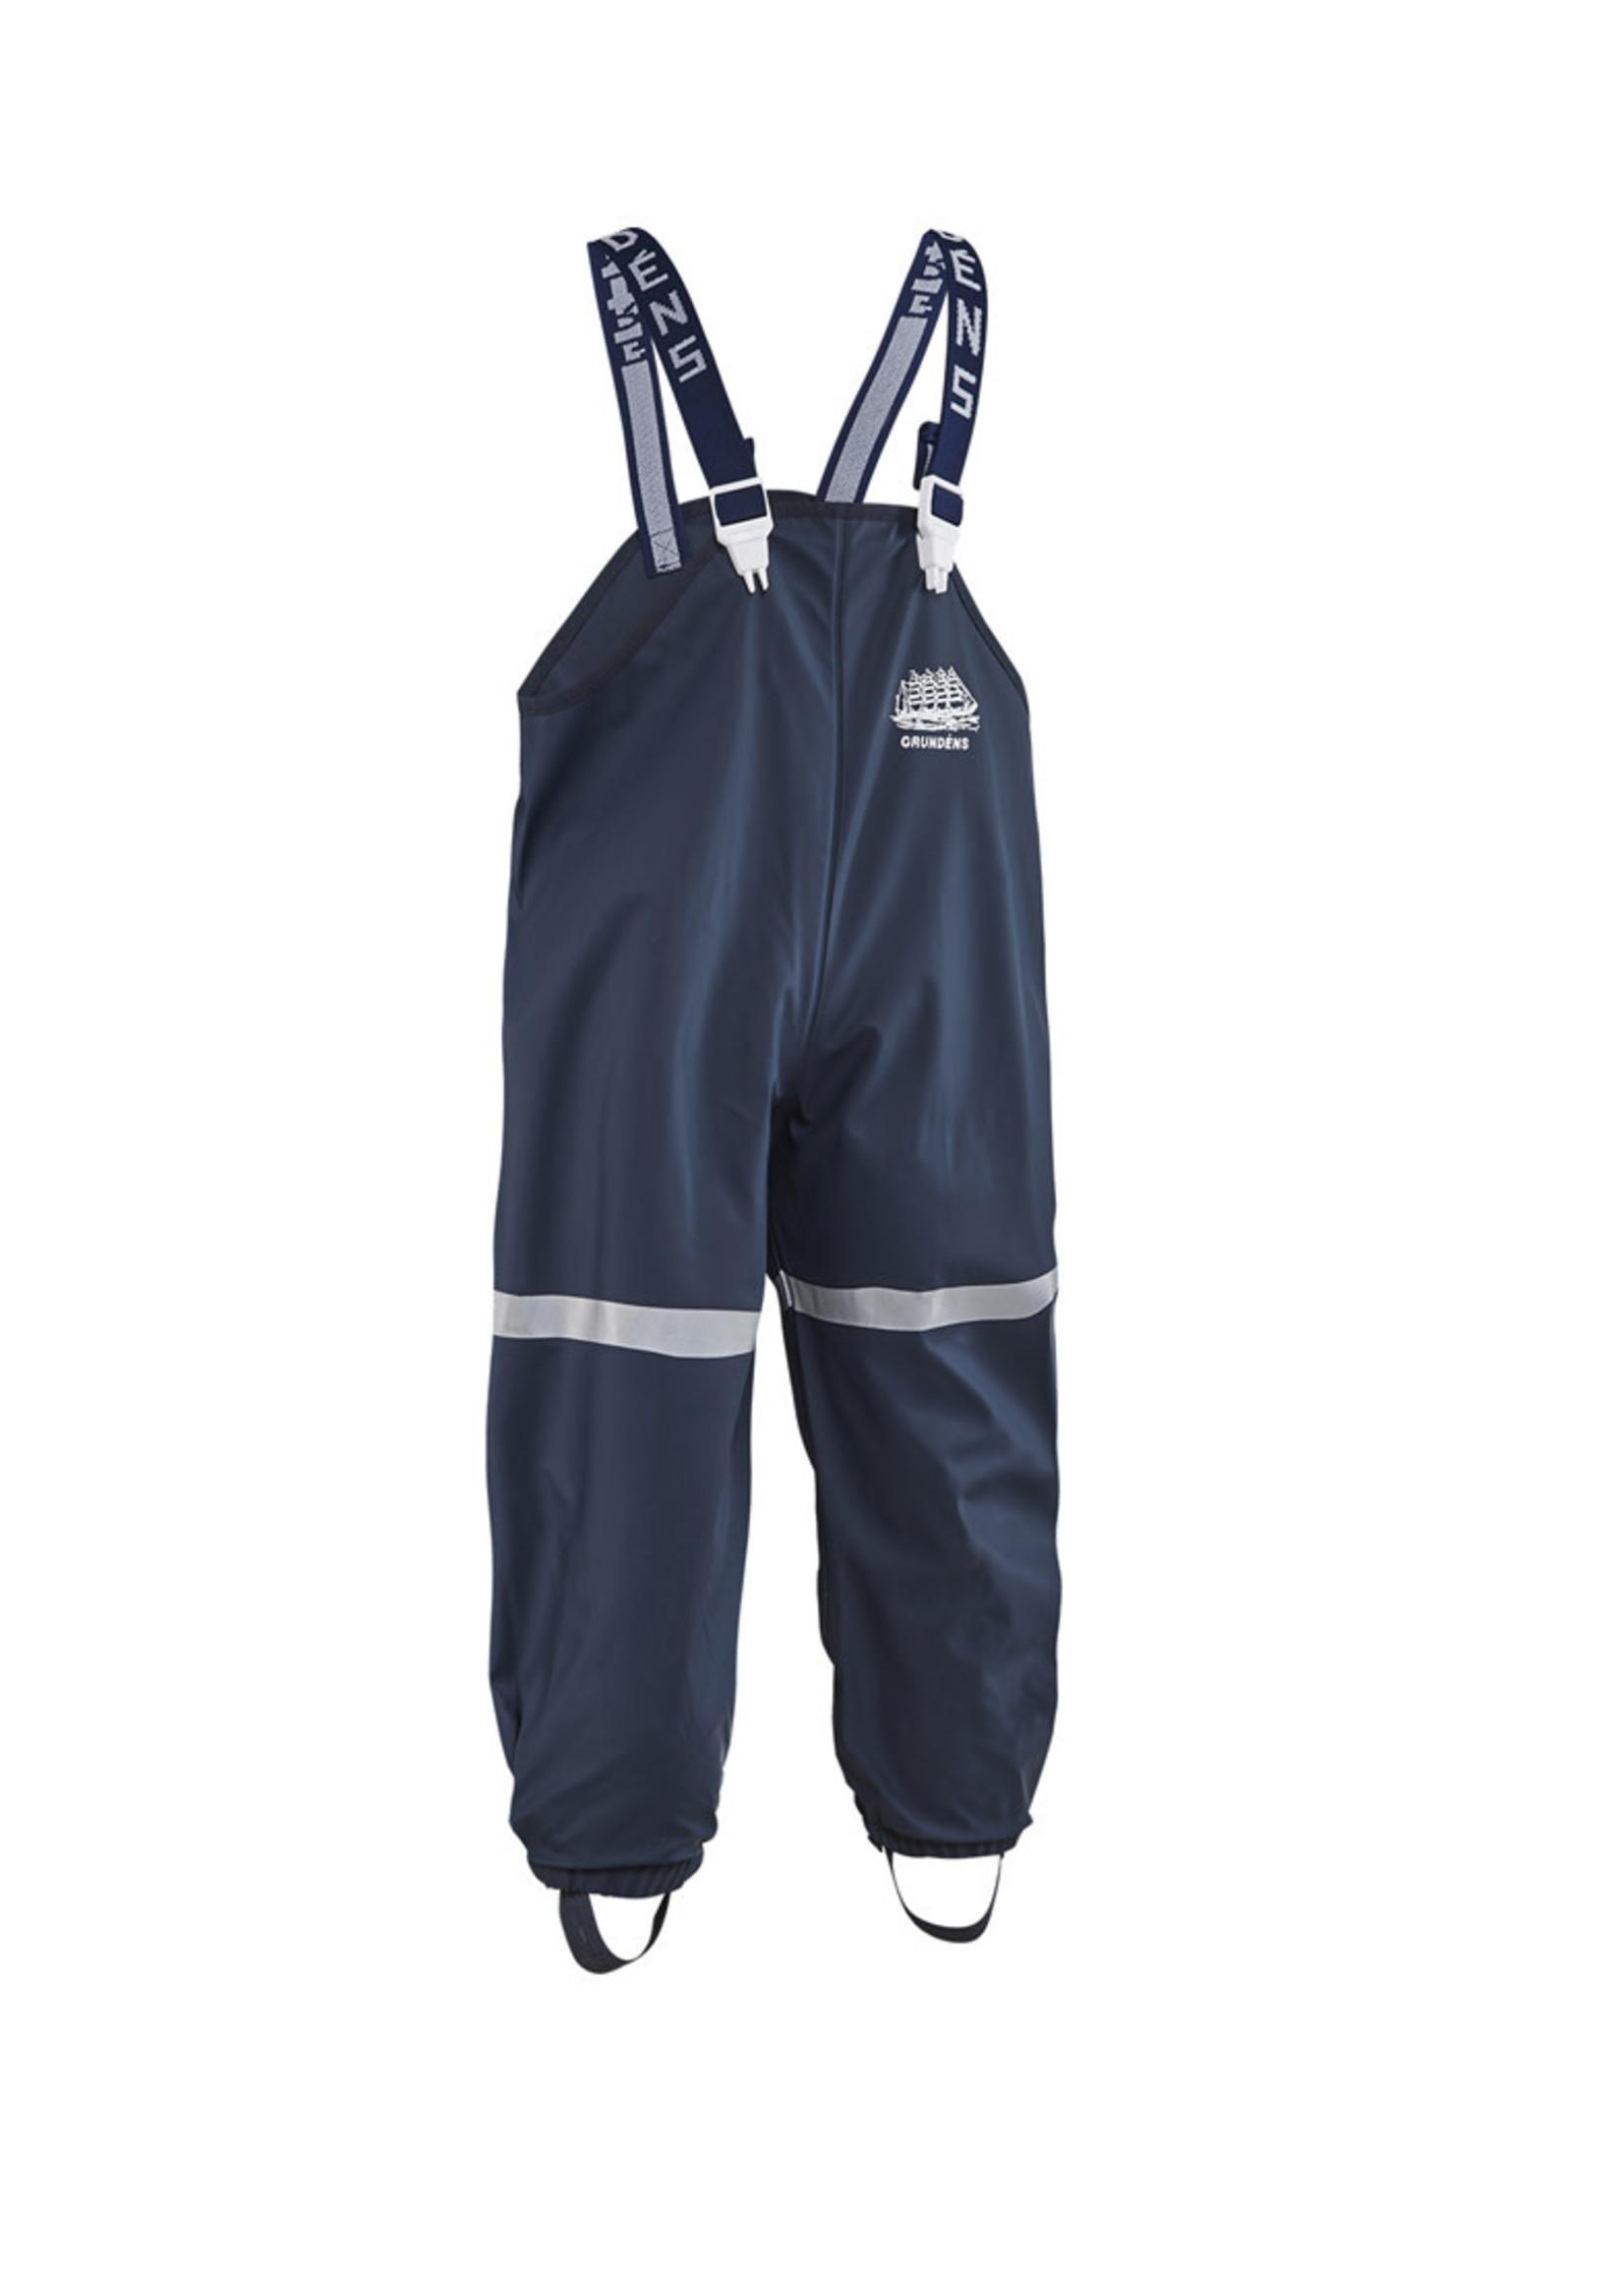 GRUNDENS USA, LTD. Grundens Child's Bib Trouser